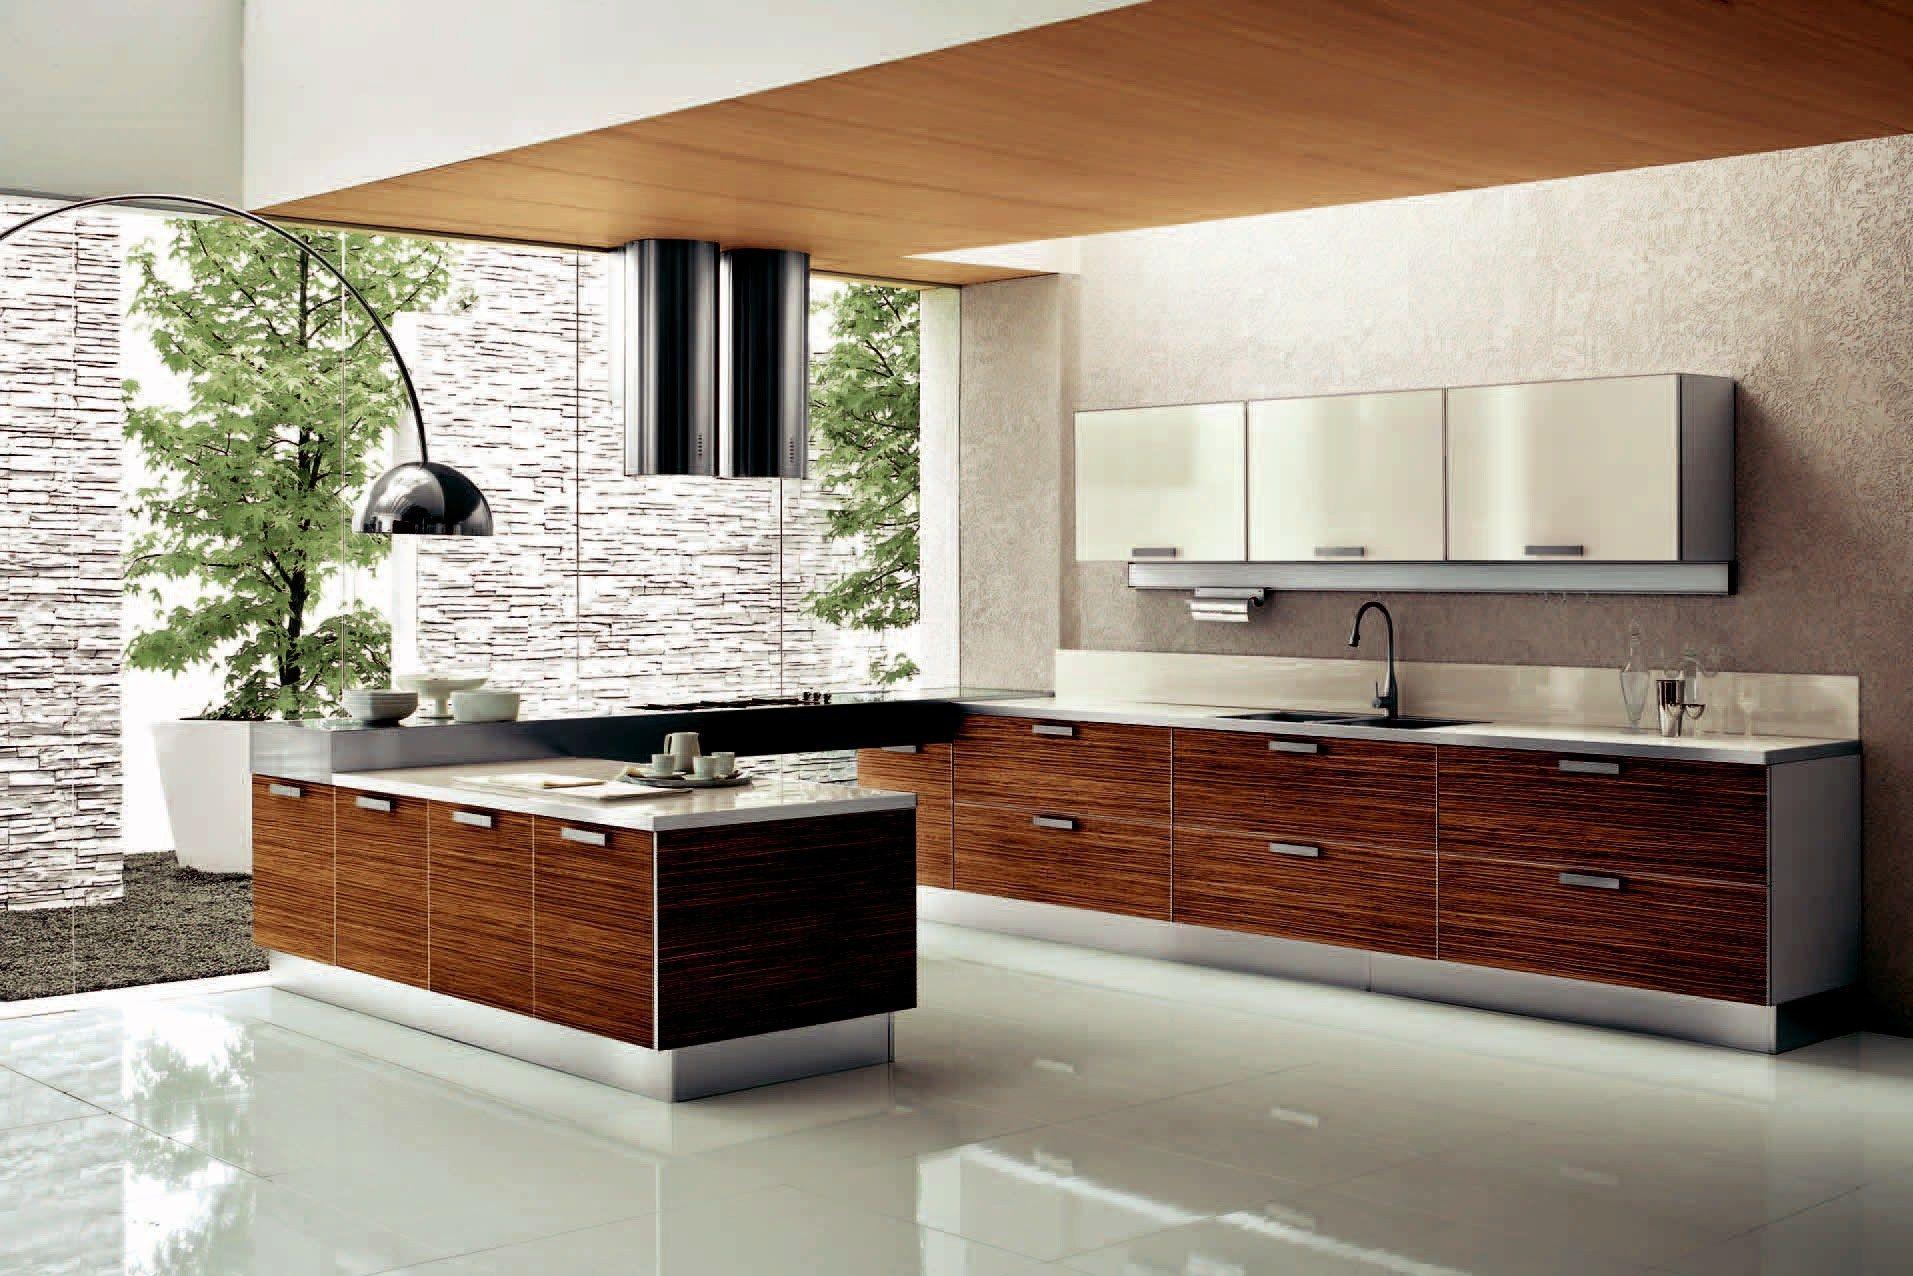 Aluminum And Wood Kitchen Set